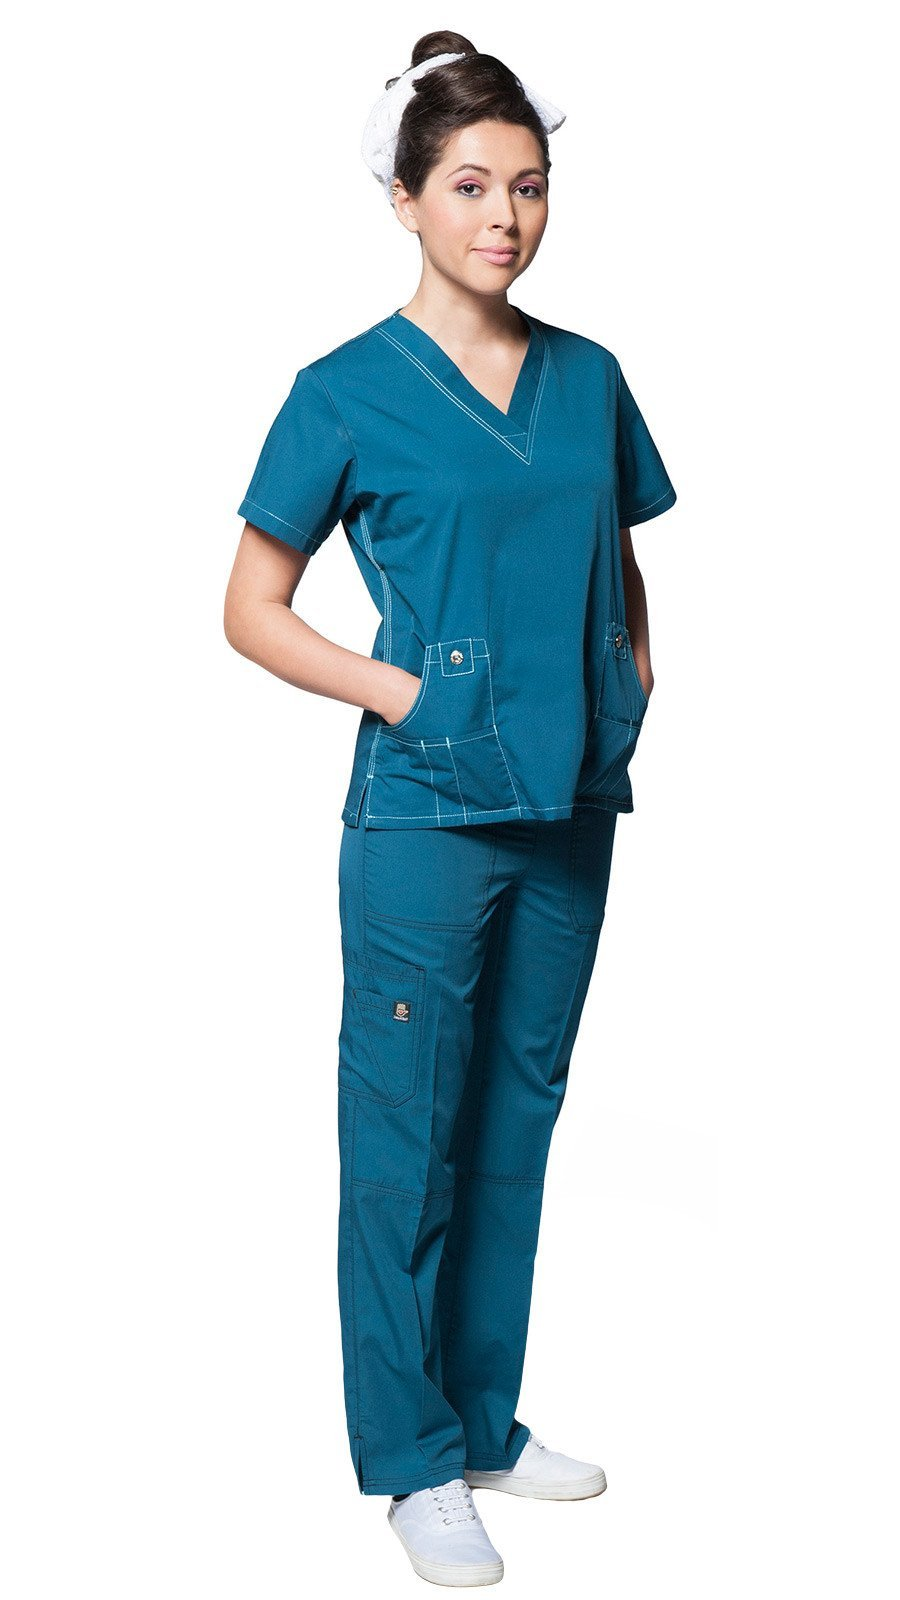 Dress A Med Women's Designer Double Stitched Medical Scrubs